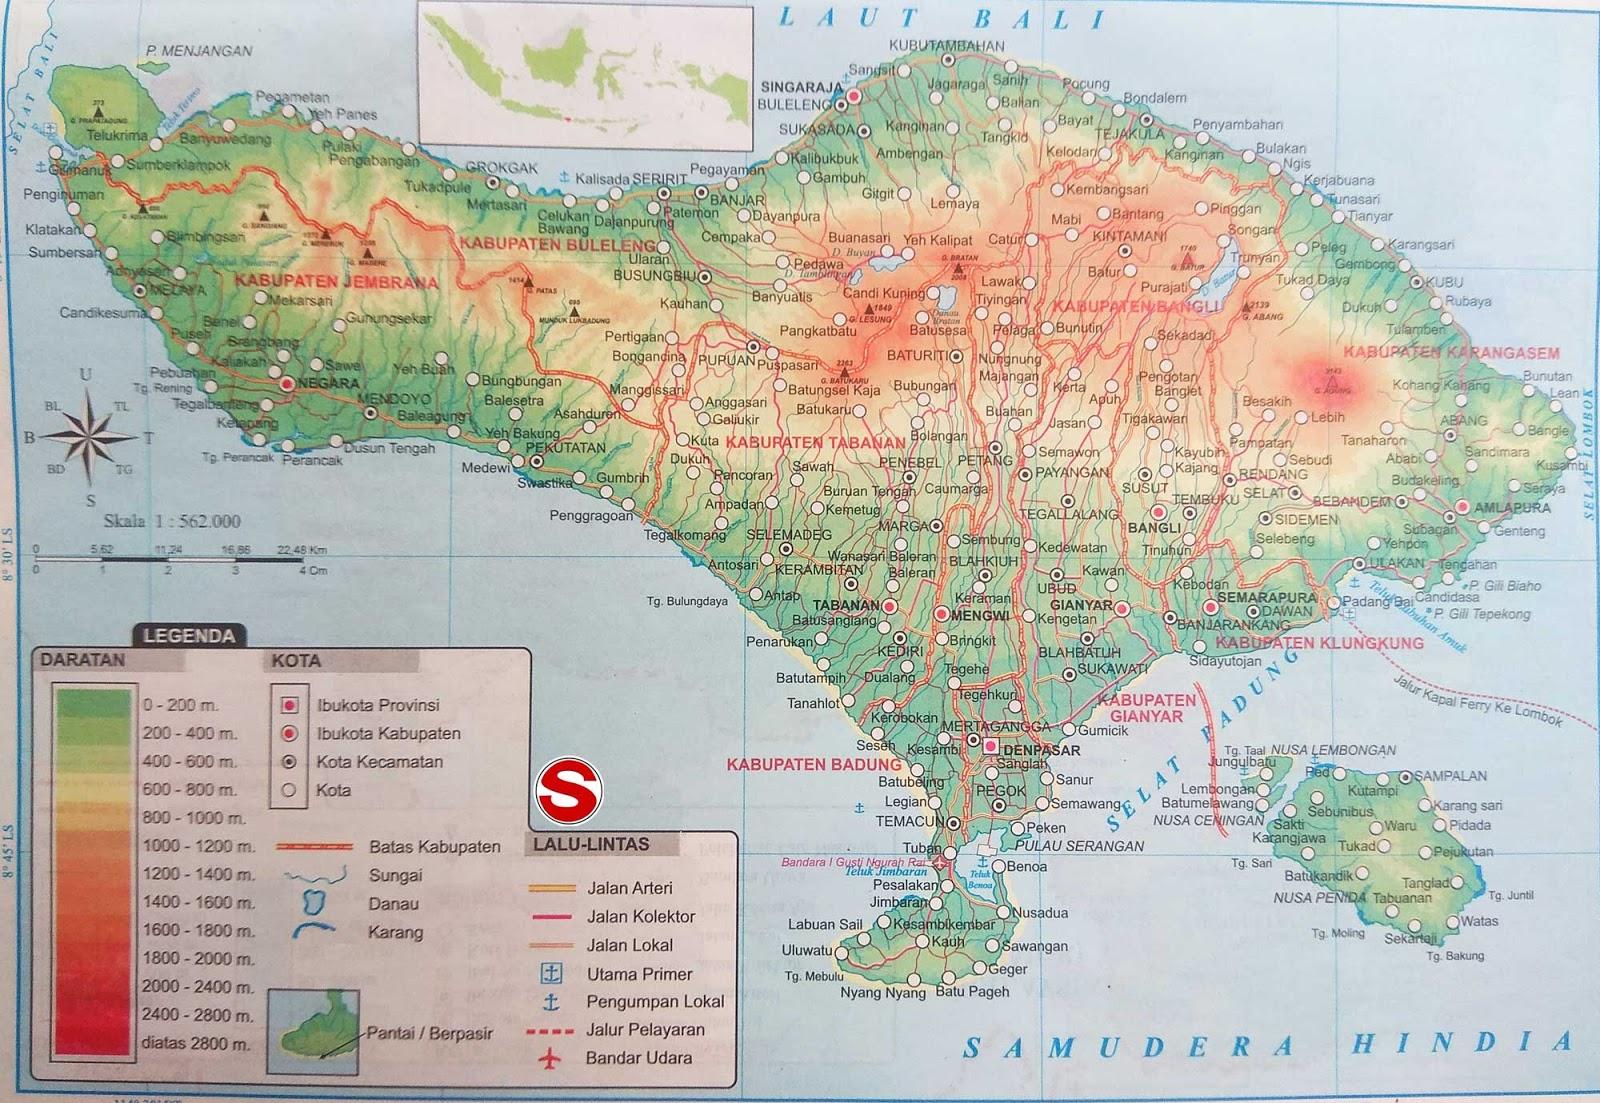 Peta Provinsi Bali di bawah ini mencakup peta dataran Peta Atlas Provinsi Bali